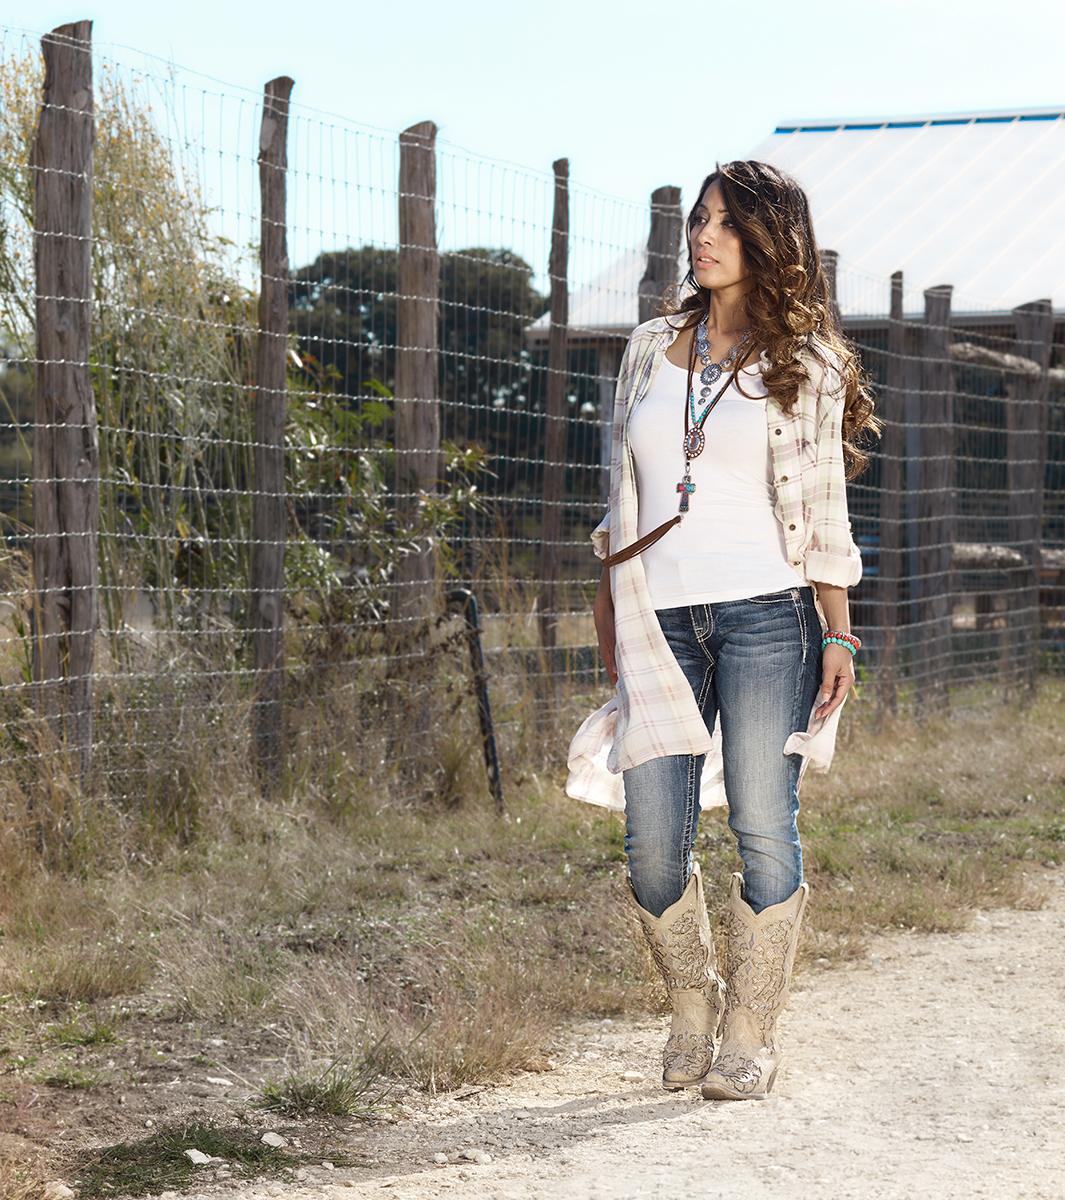 Ranch Walking